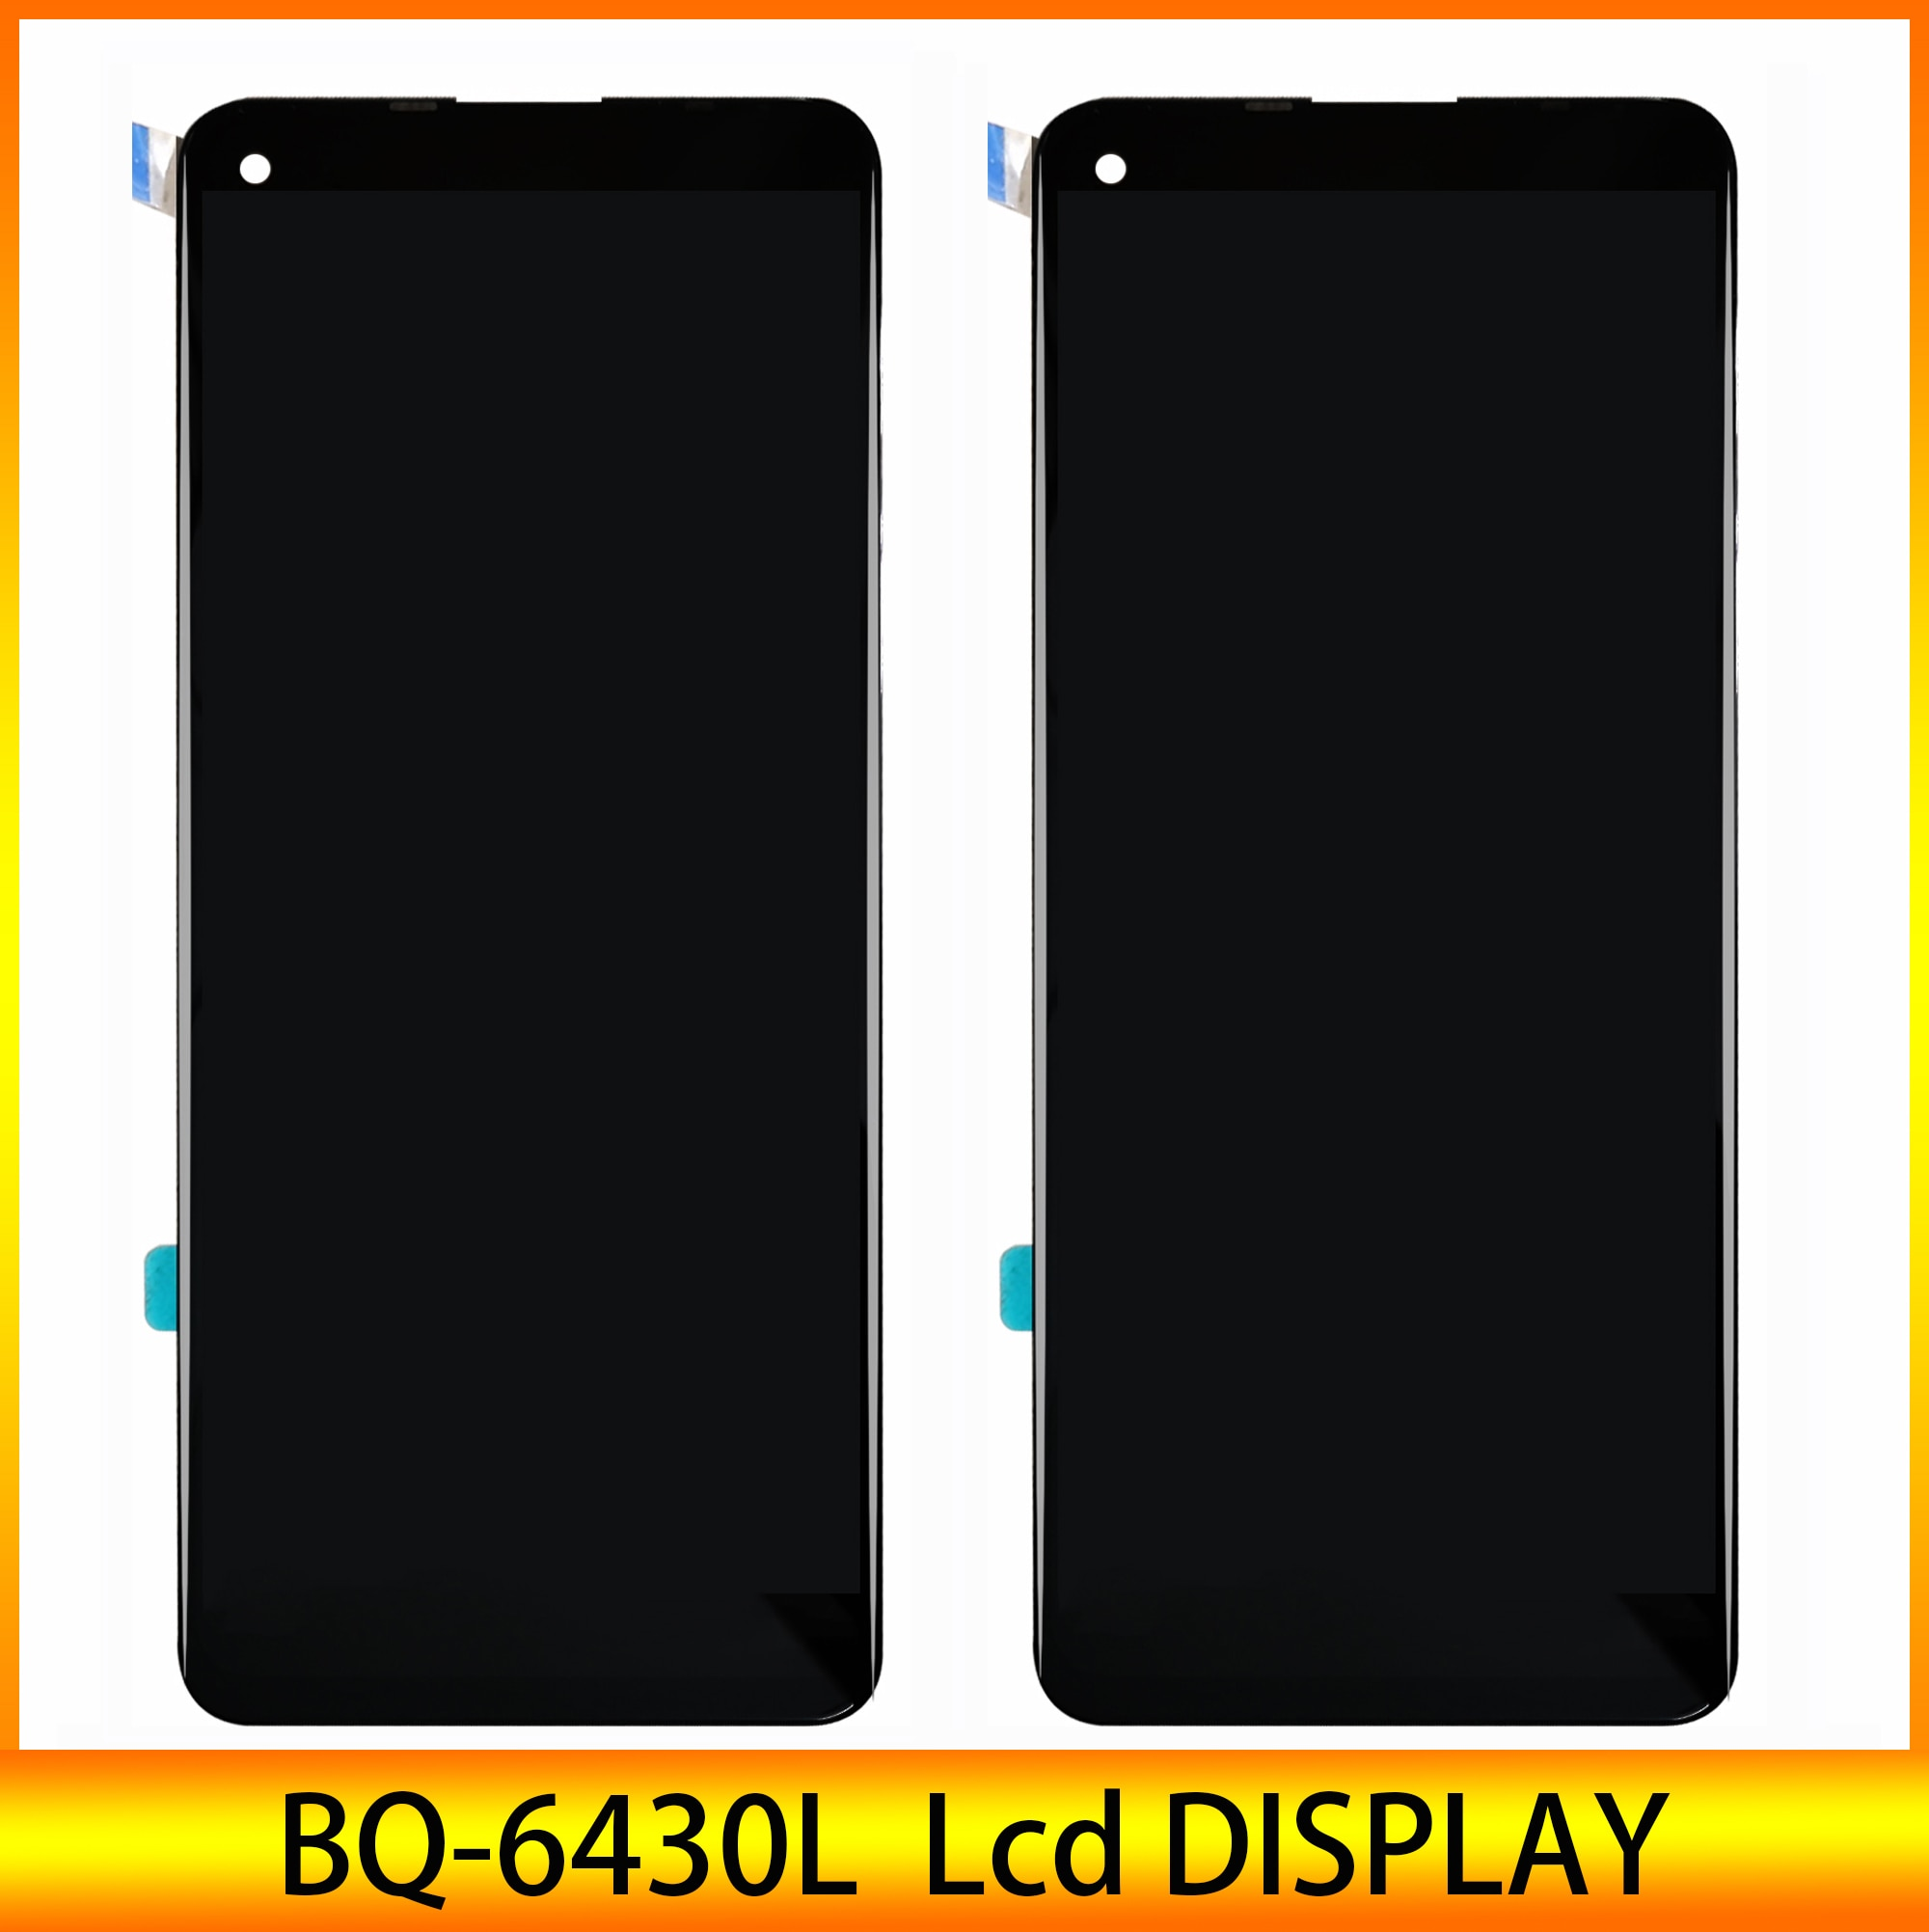 جديد LCD ل BQ المحمول BQ-6430L أورورا bq-6430l LCD عرض مع شاشة تعمل باللمس محول الأرقام الجمعية 100% الكمال إصلاح